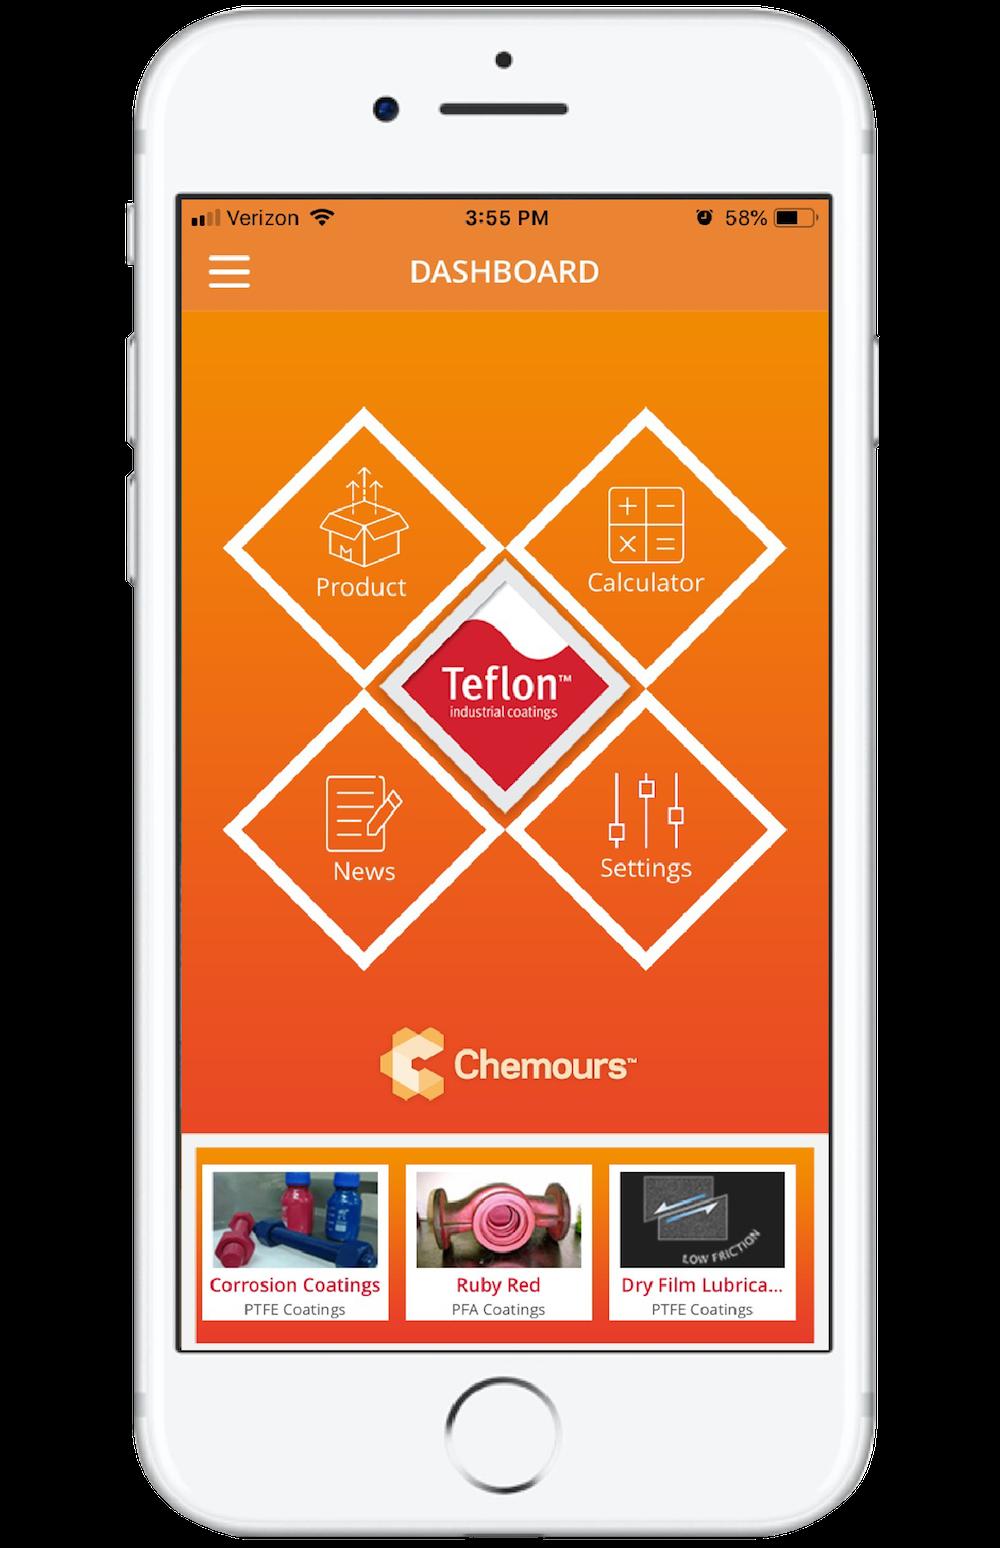 My Teflon App: Teflon information, Teflon products, Teflon markets, Teflon properties, and more